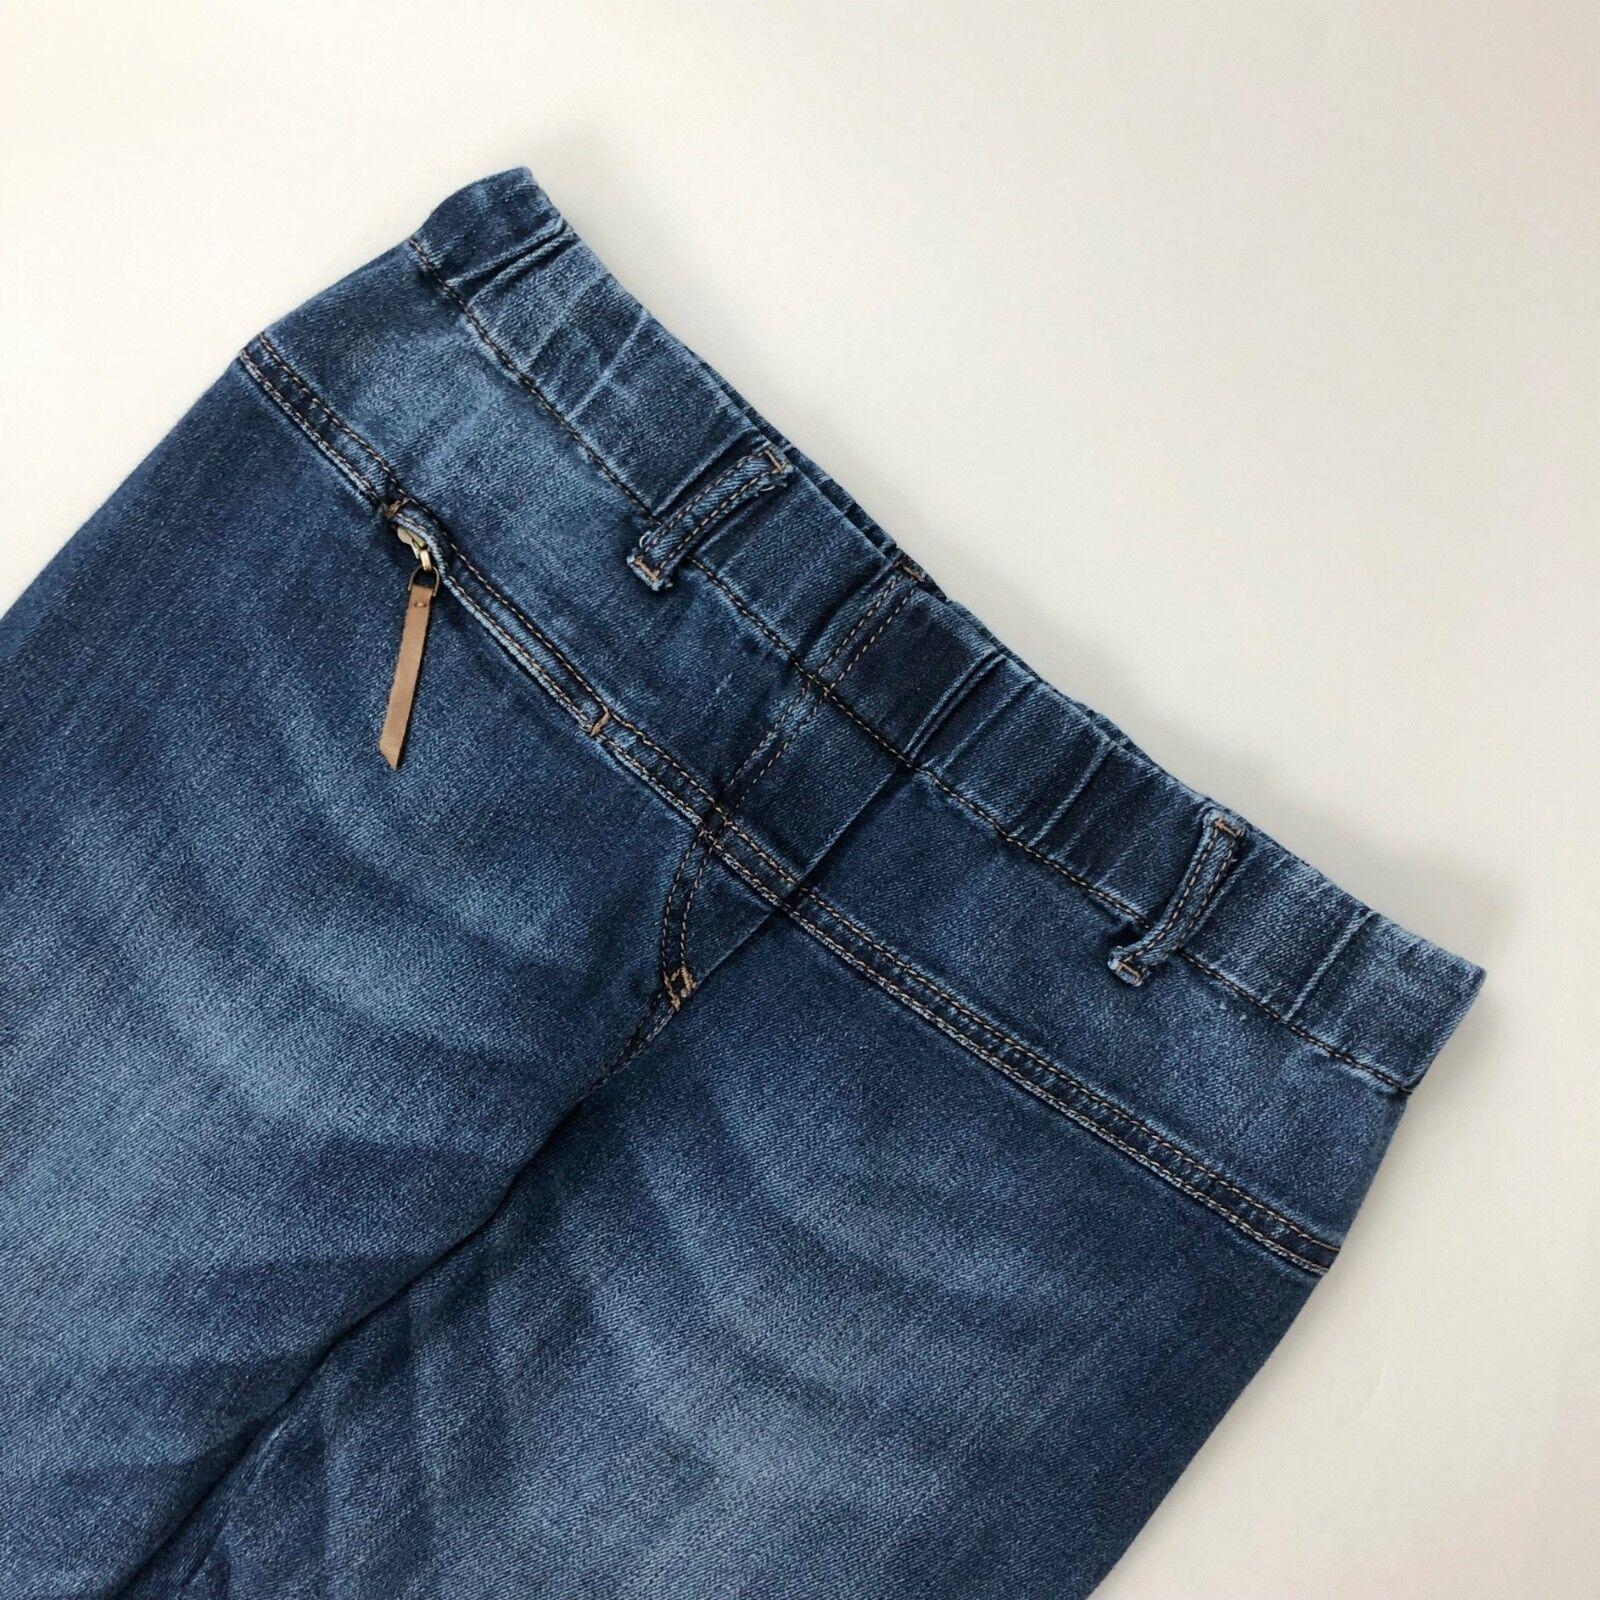 Brunello Cucinelli Ladies Slim Fit Blau Denim Trousers Jeans Größe S IT42 US2 4